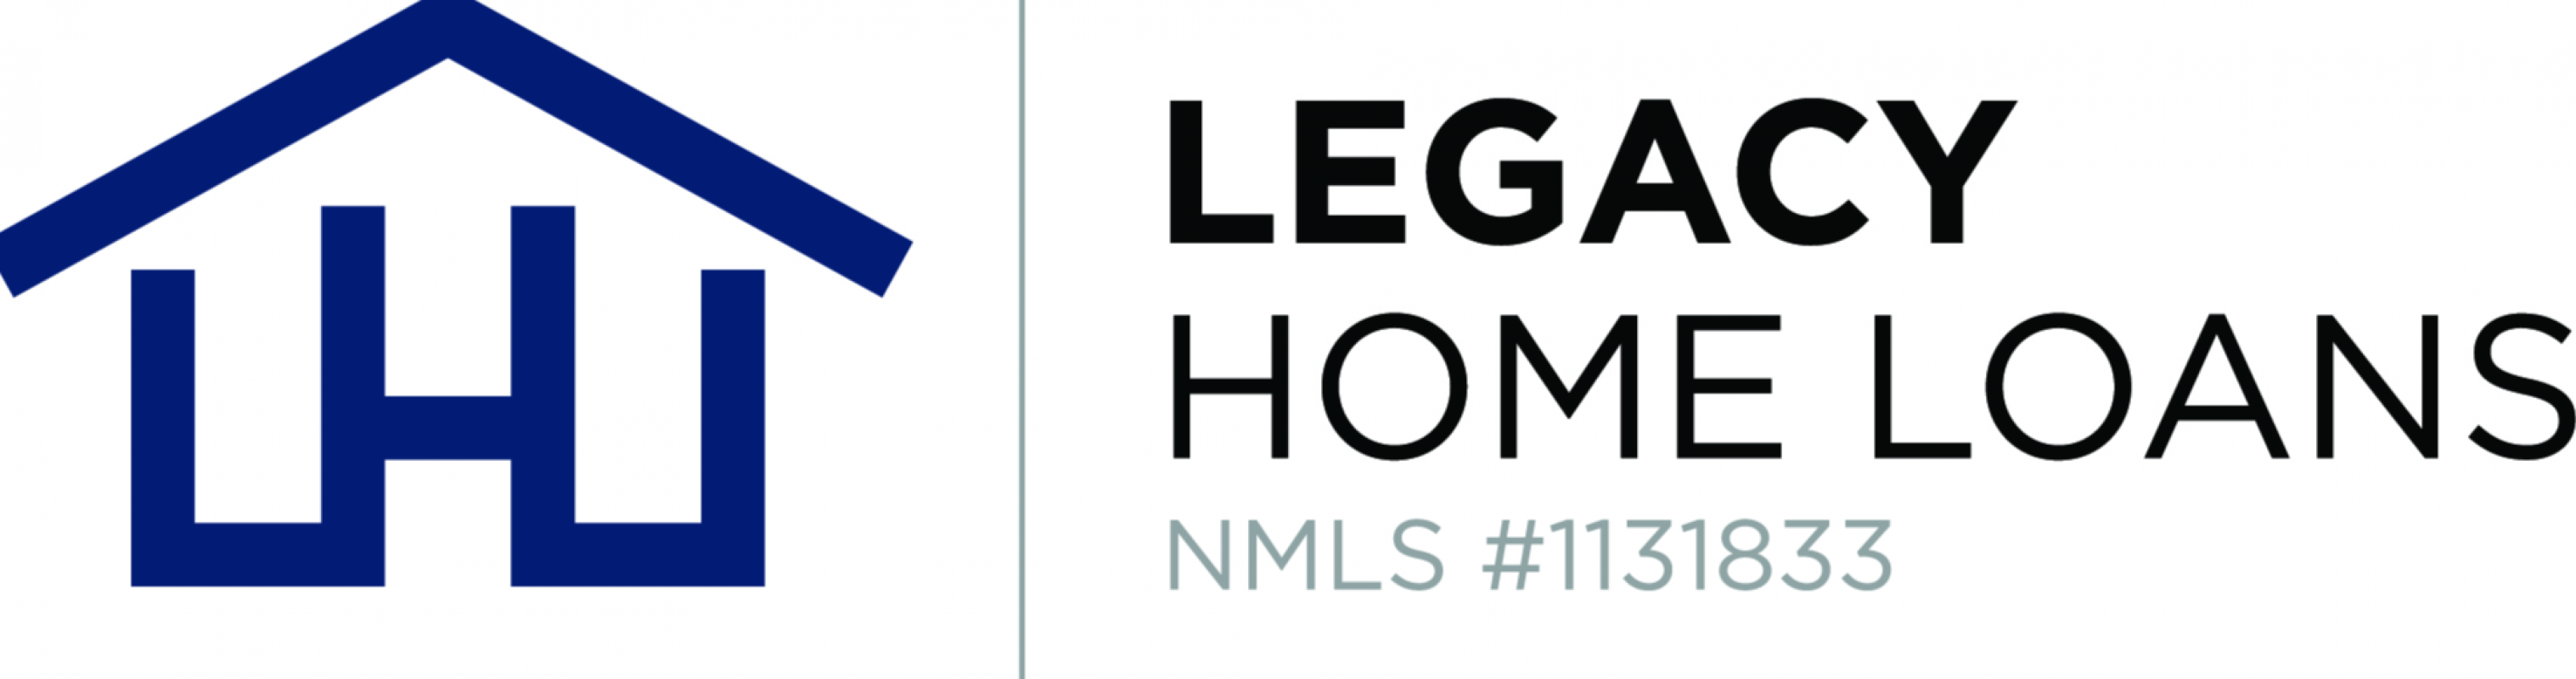 Legacy Home Loans logo